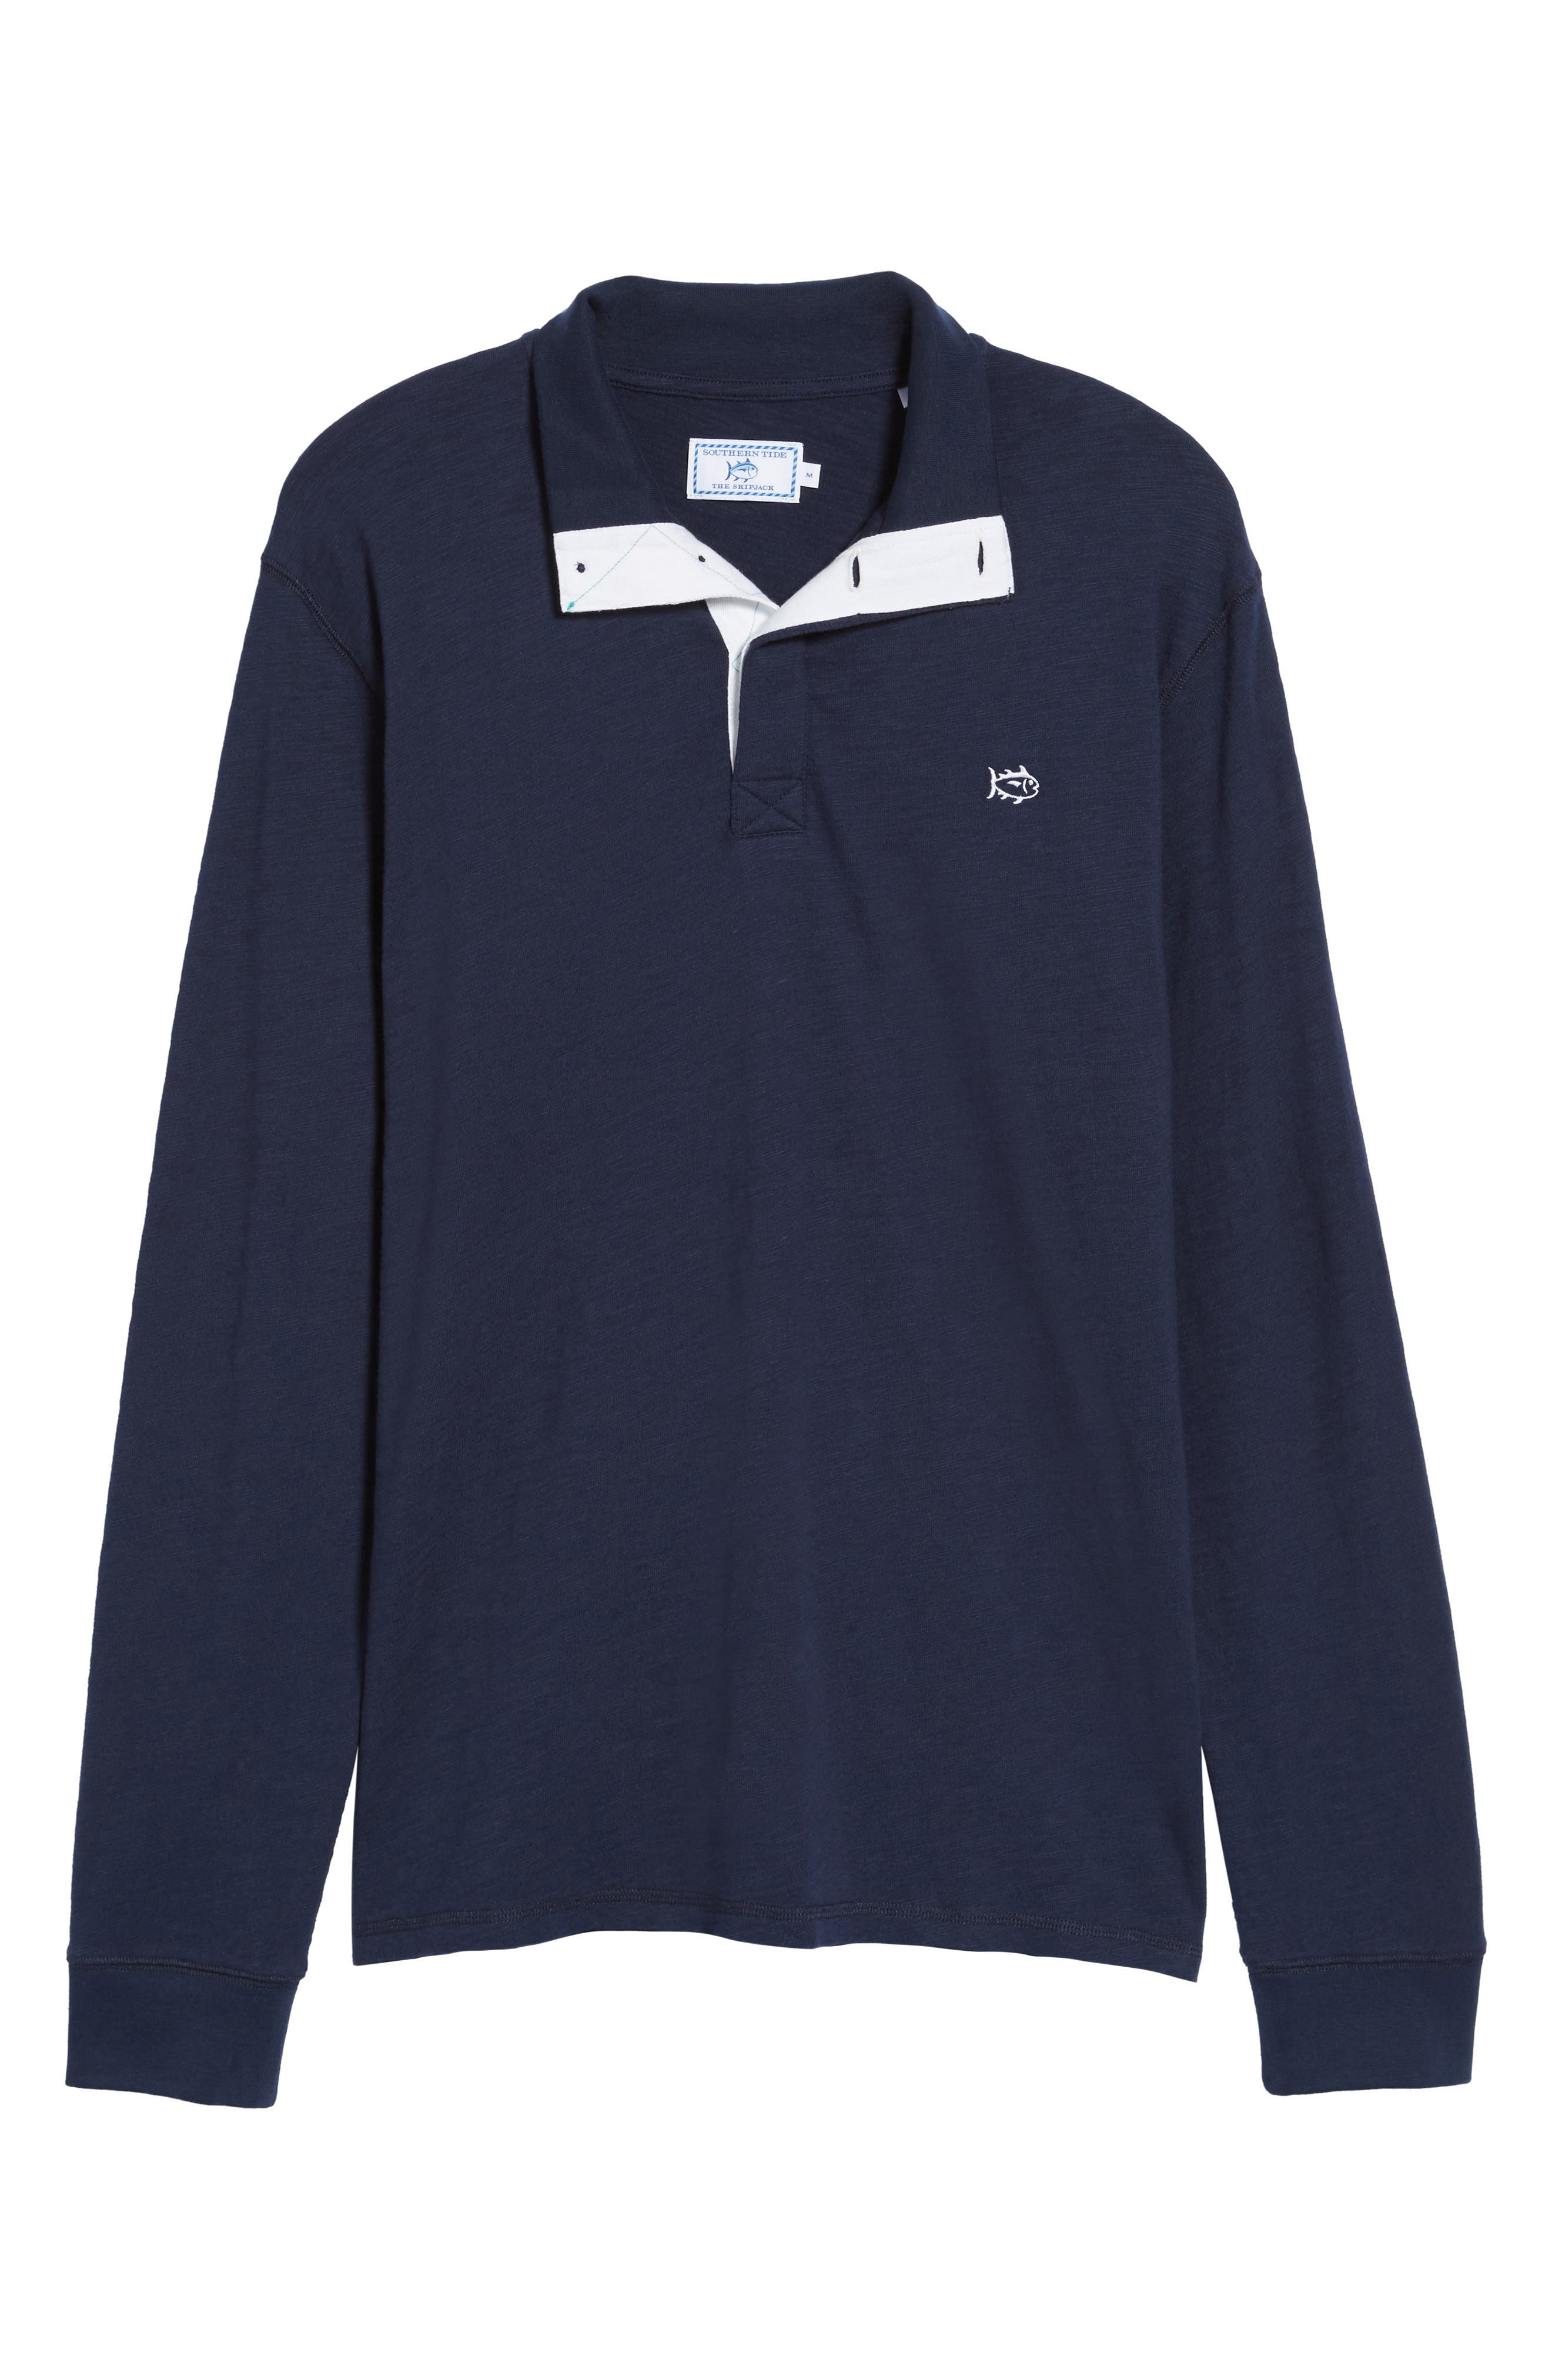 Gulf Stream Sweatshirt,                             Alternate thumbnail 6, color,                             408